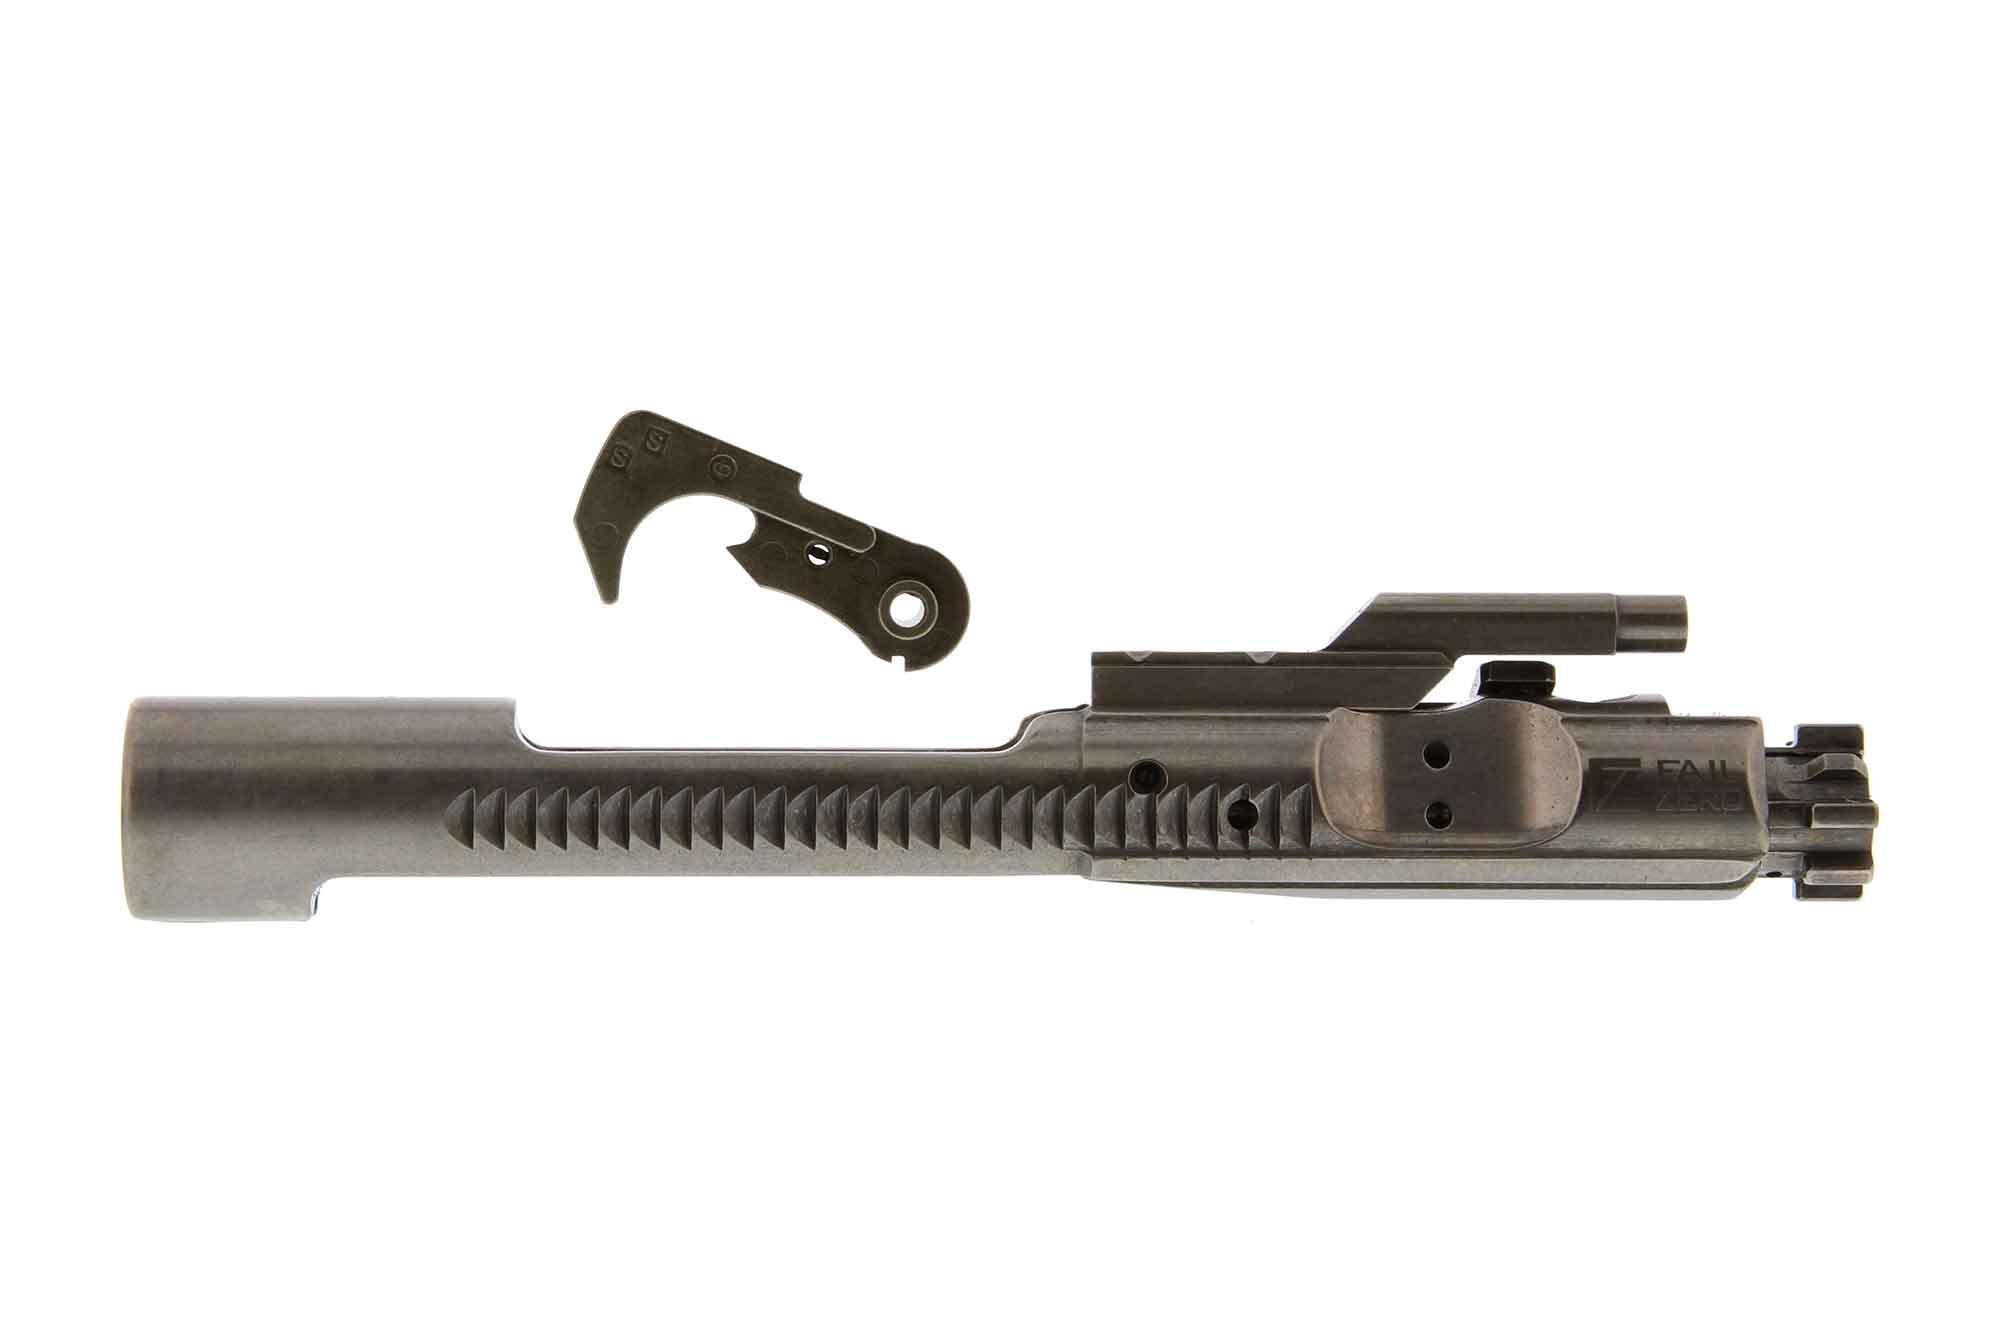 failzero exo coated ar 15 bolt carrier group semi auto hammer 009 fzar15 01. Black Bedroom Furniture Sets. Home Design Ideas